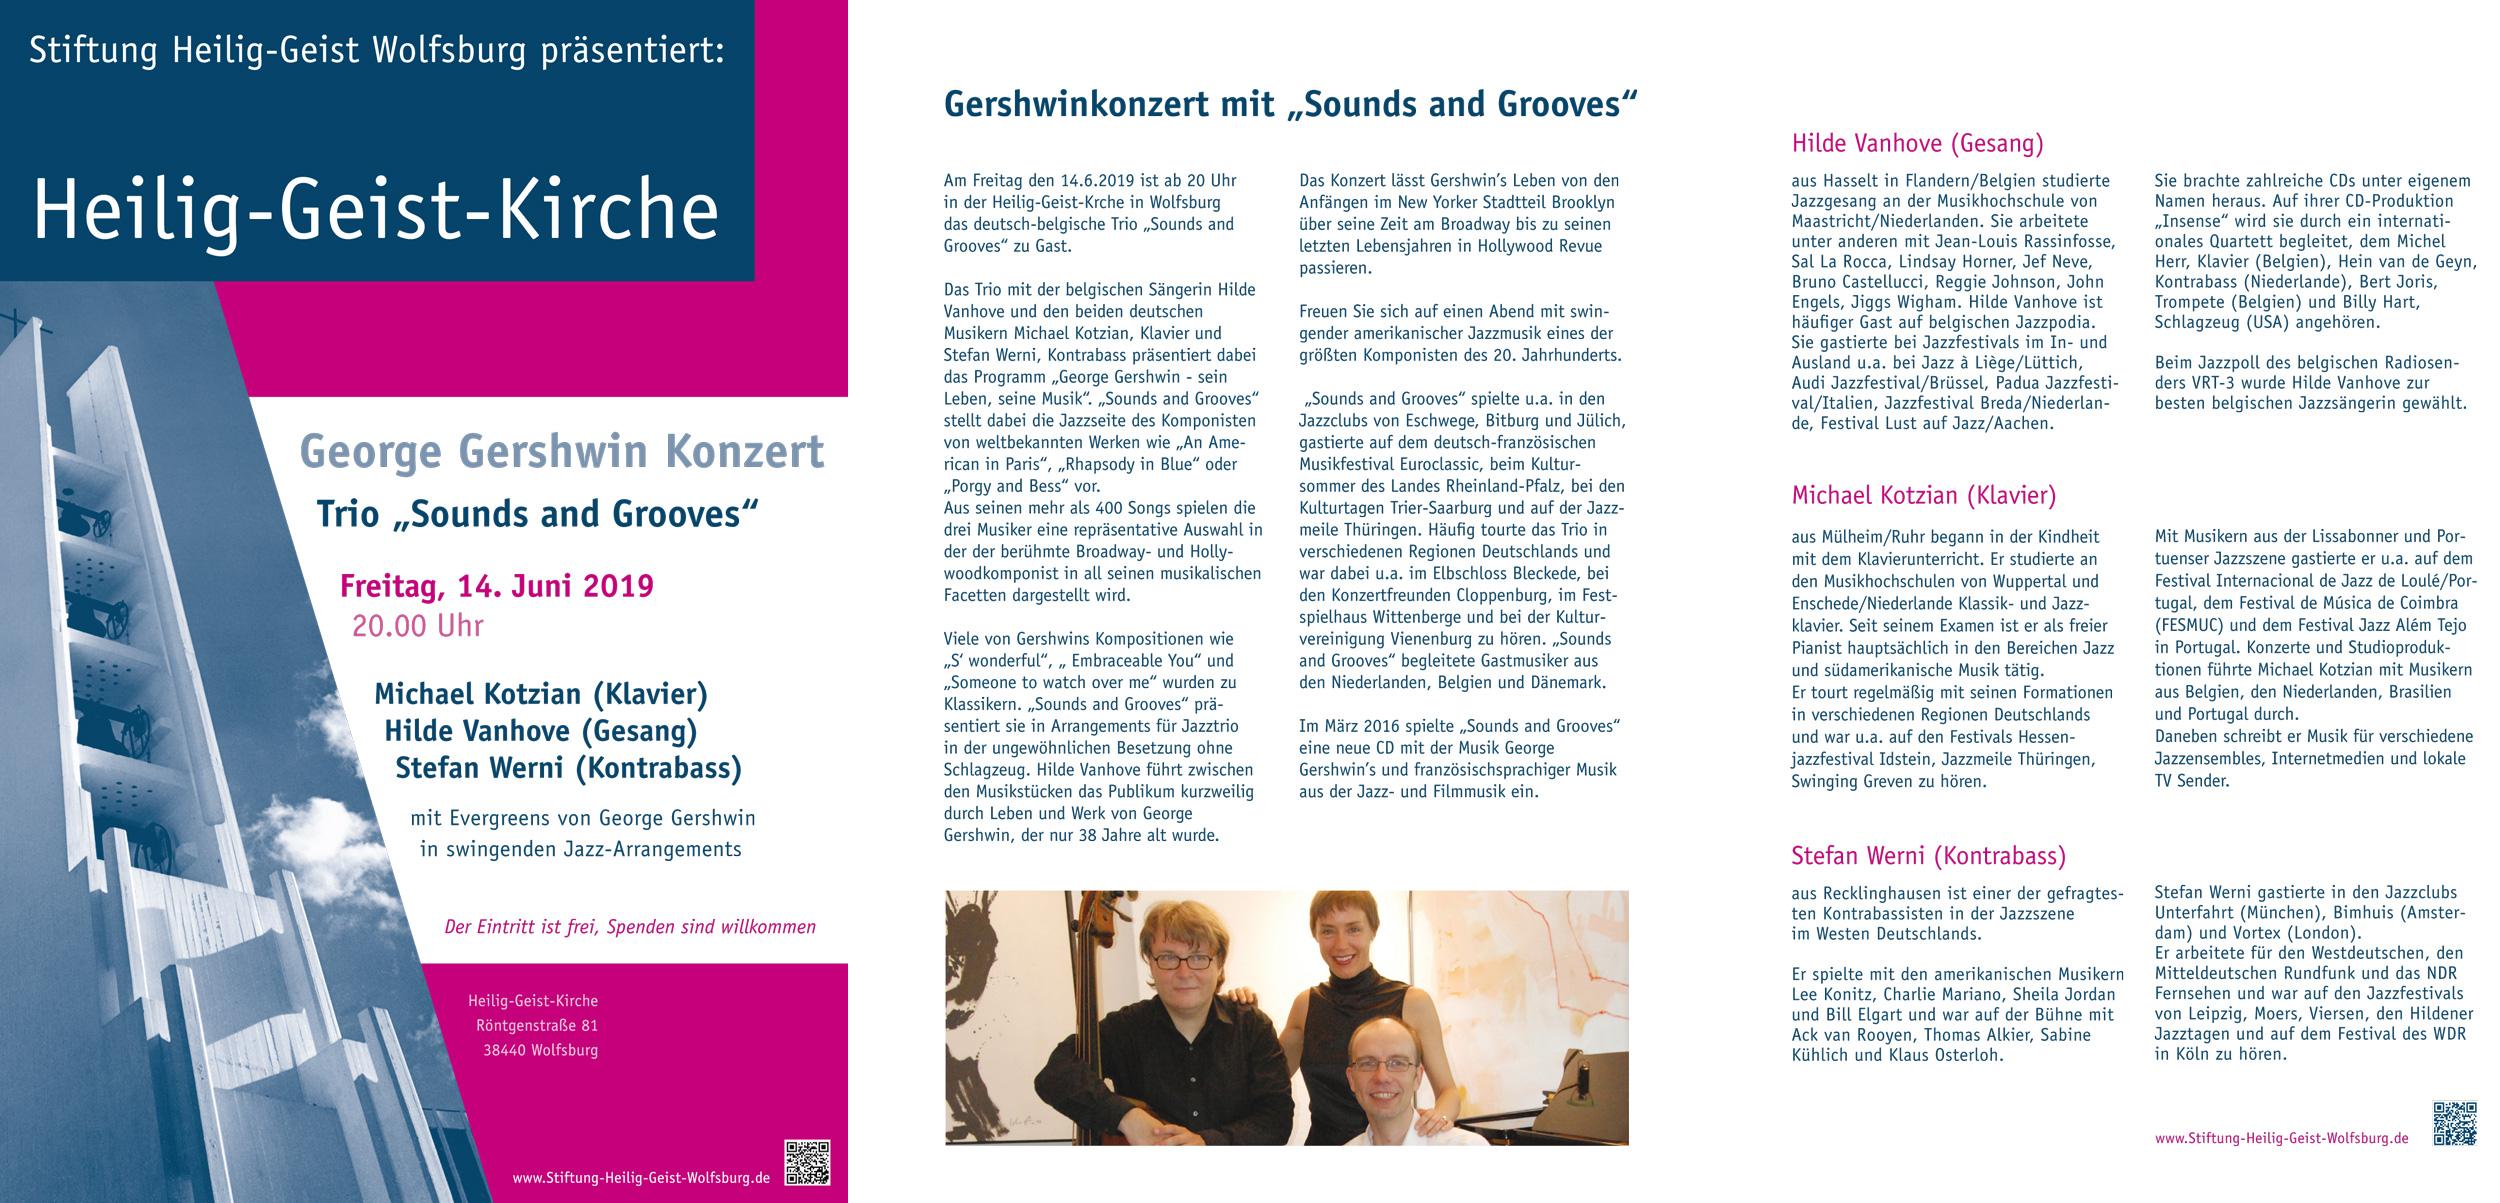 Flyer-Konzert-George-Gershwin-2019